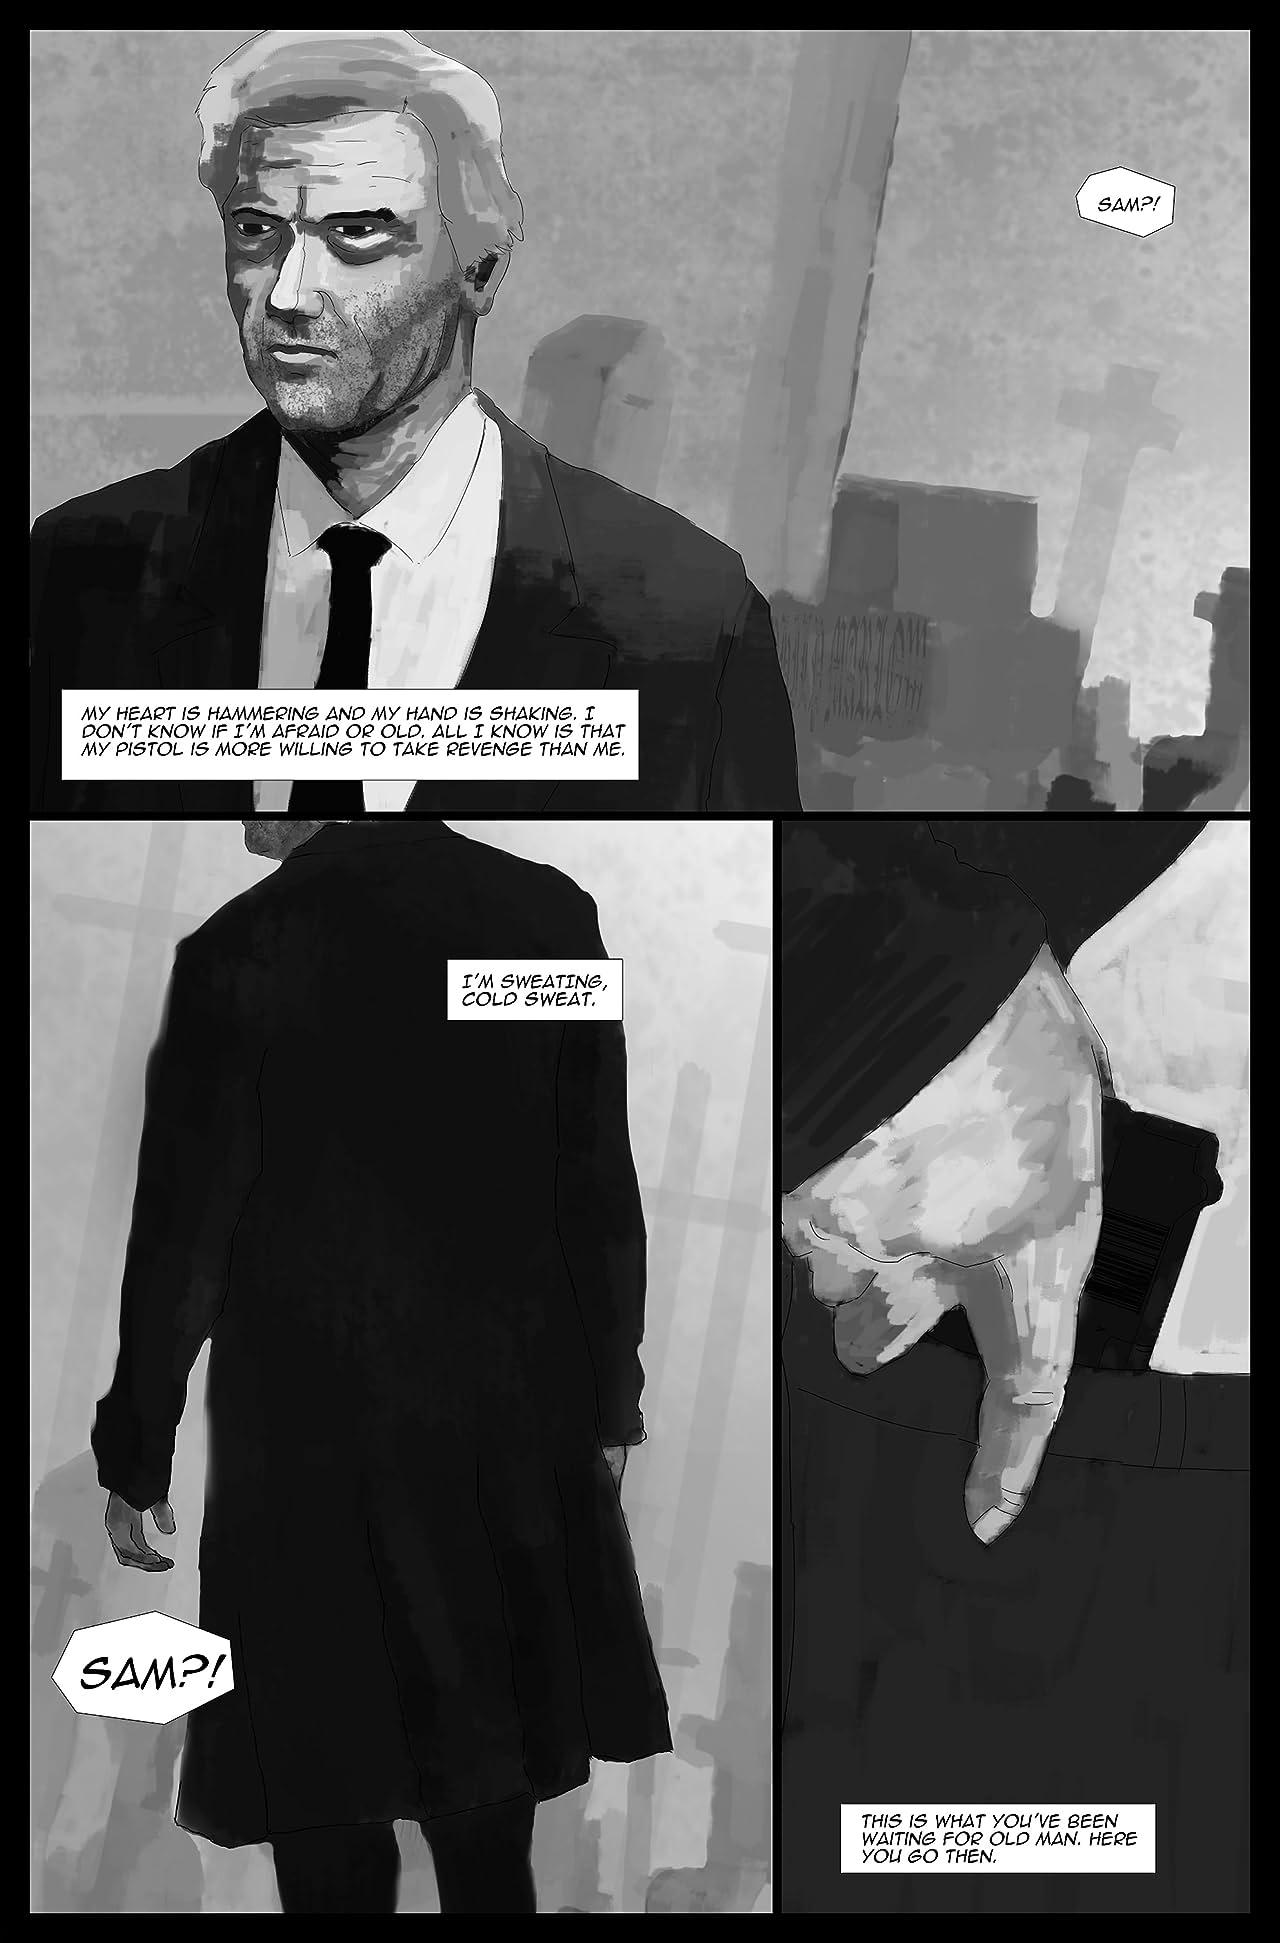 TALL SHADOWS: the narration of trust & betrayal